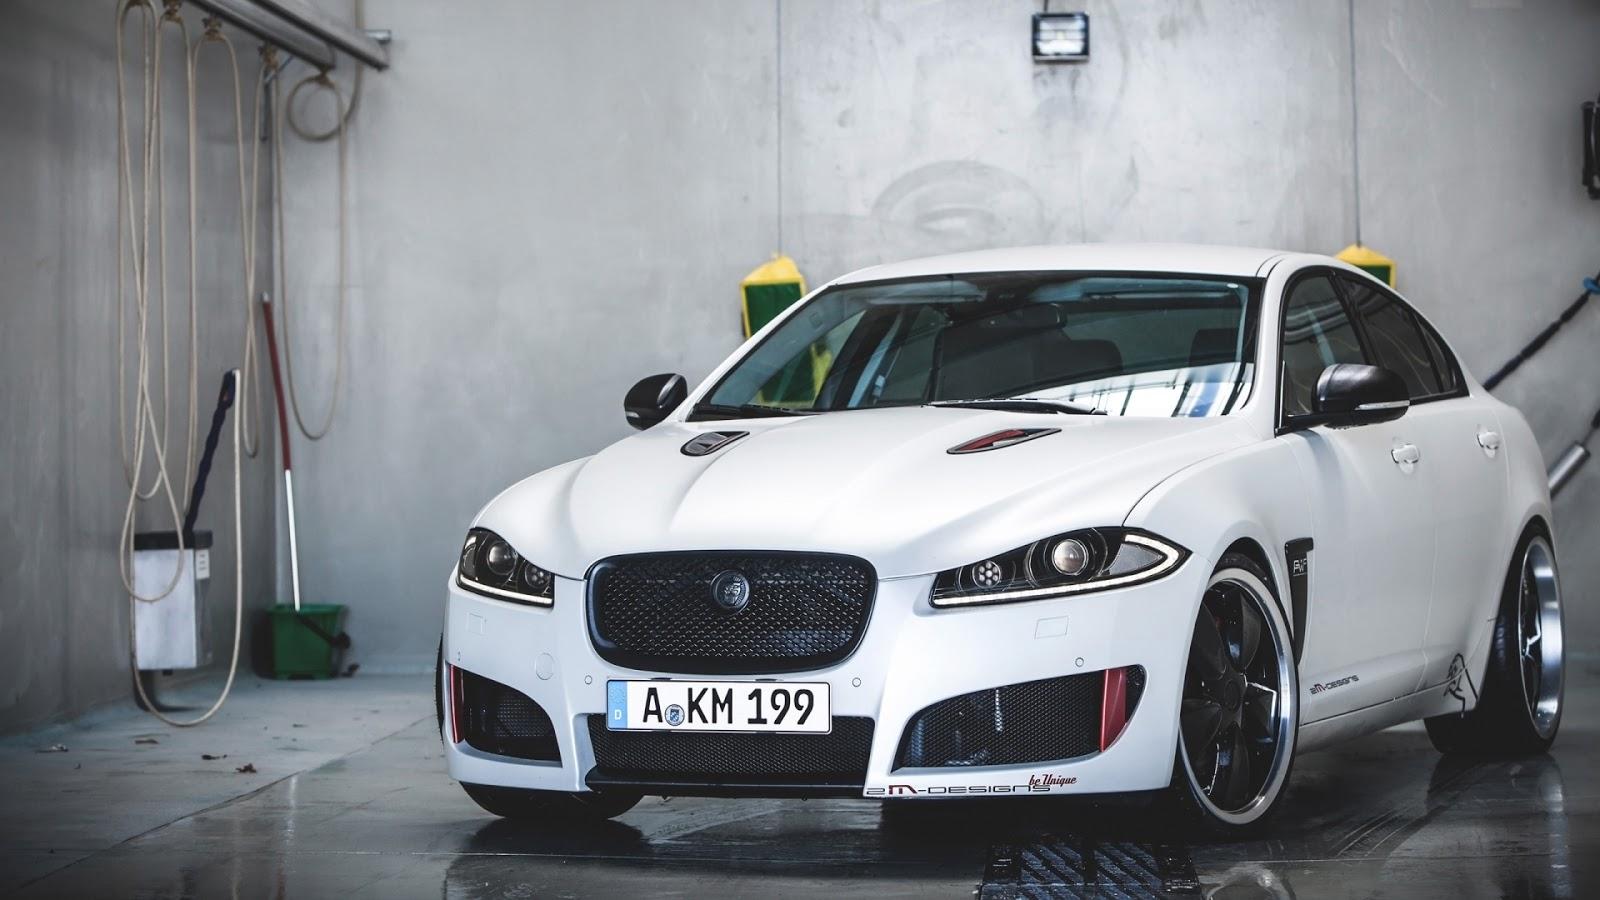 Hd wallpaper jaguar - Top 40 Jaguar Xe Hd Wallpaper Collection